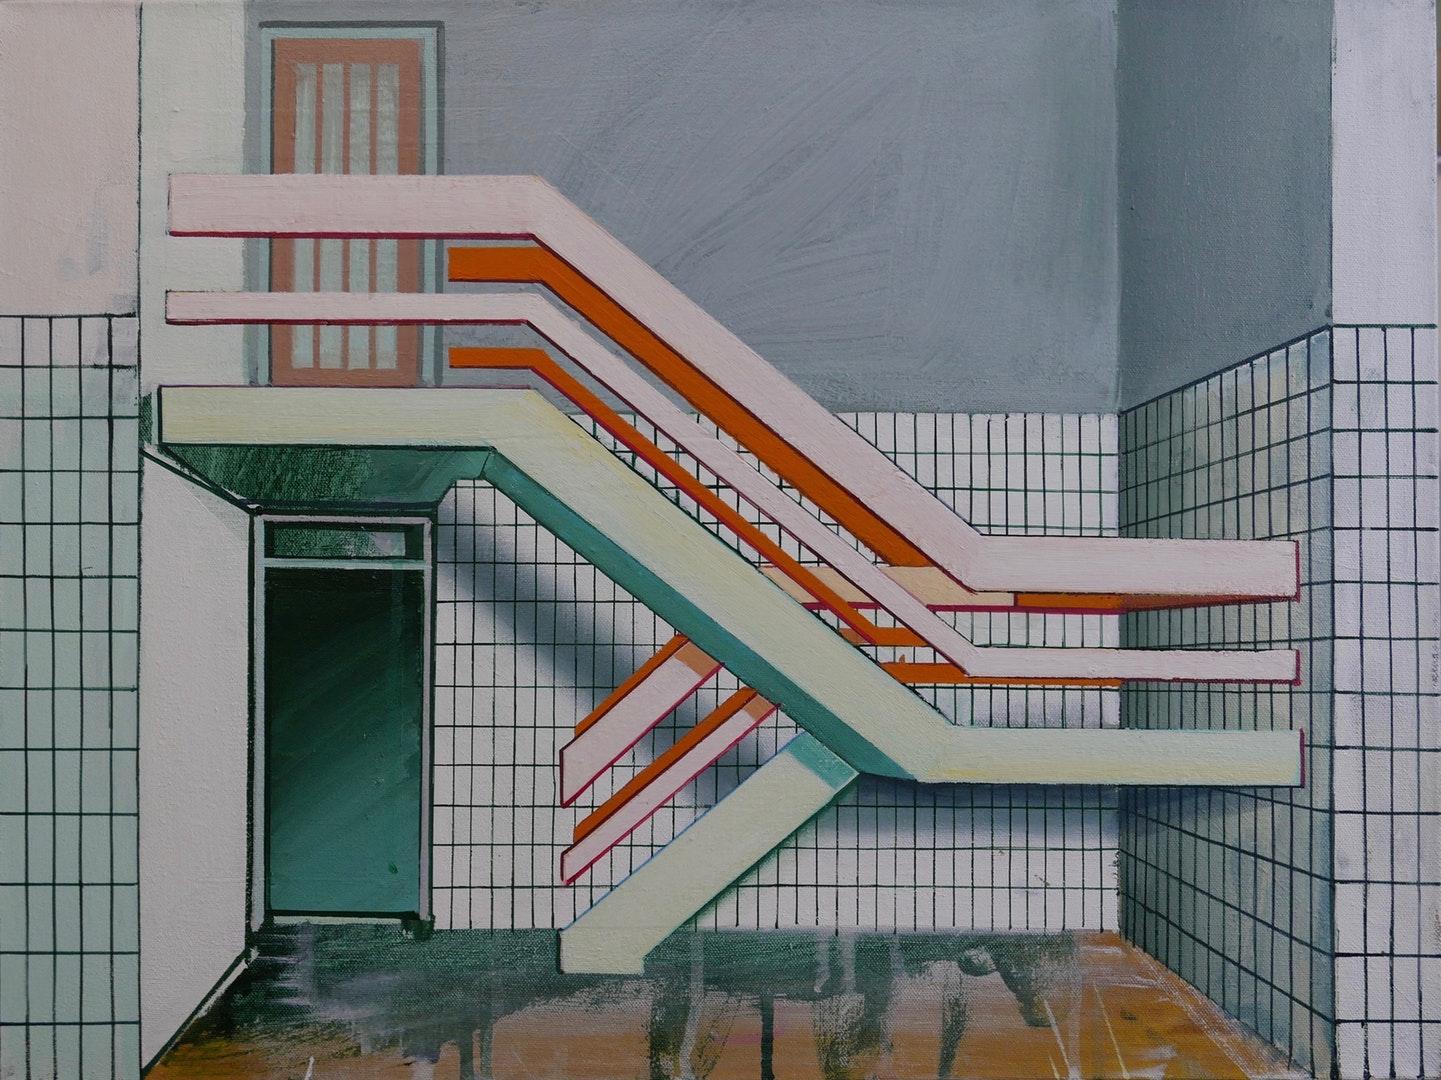 Paul Crook  Stairway  Acrylic on canvas, 60 x 45 cm  http://www.paulcrook.kk5.org